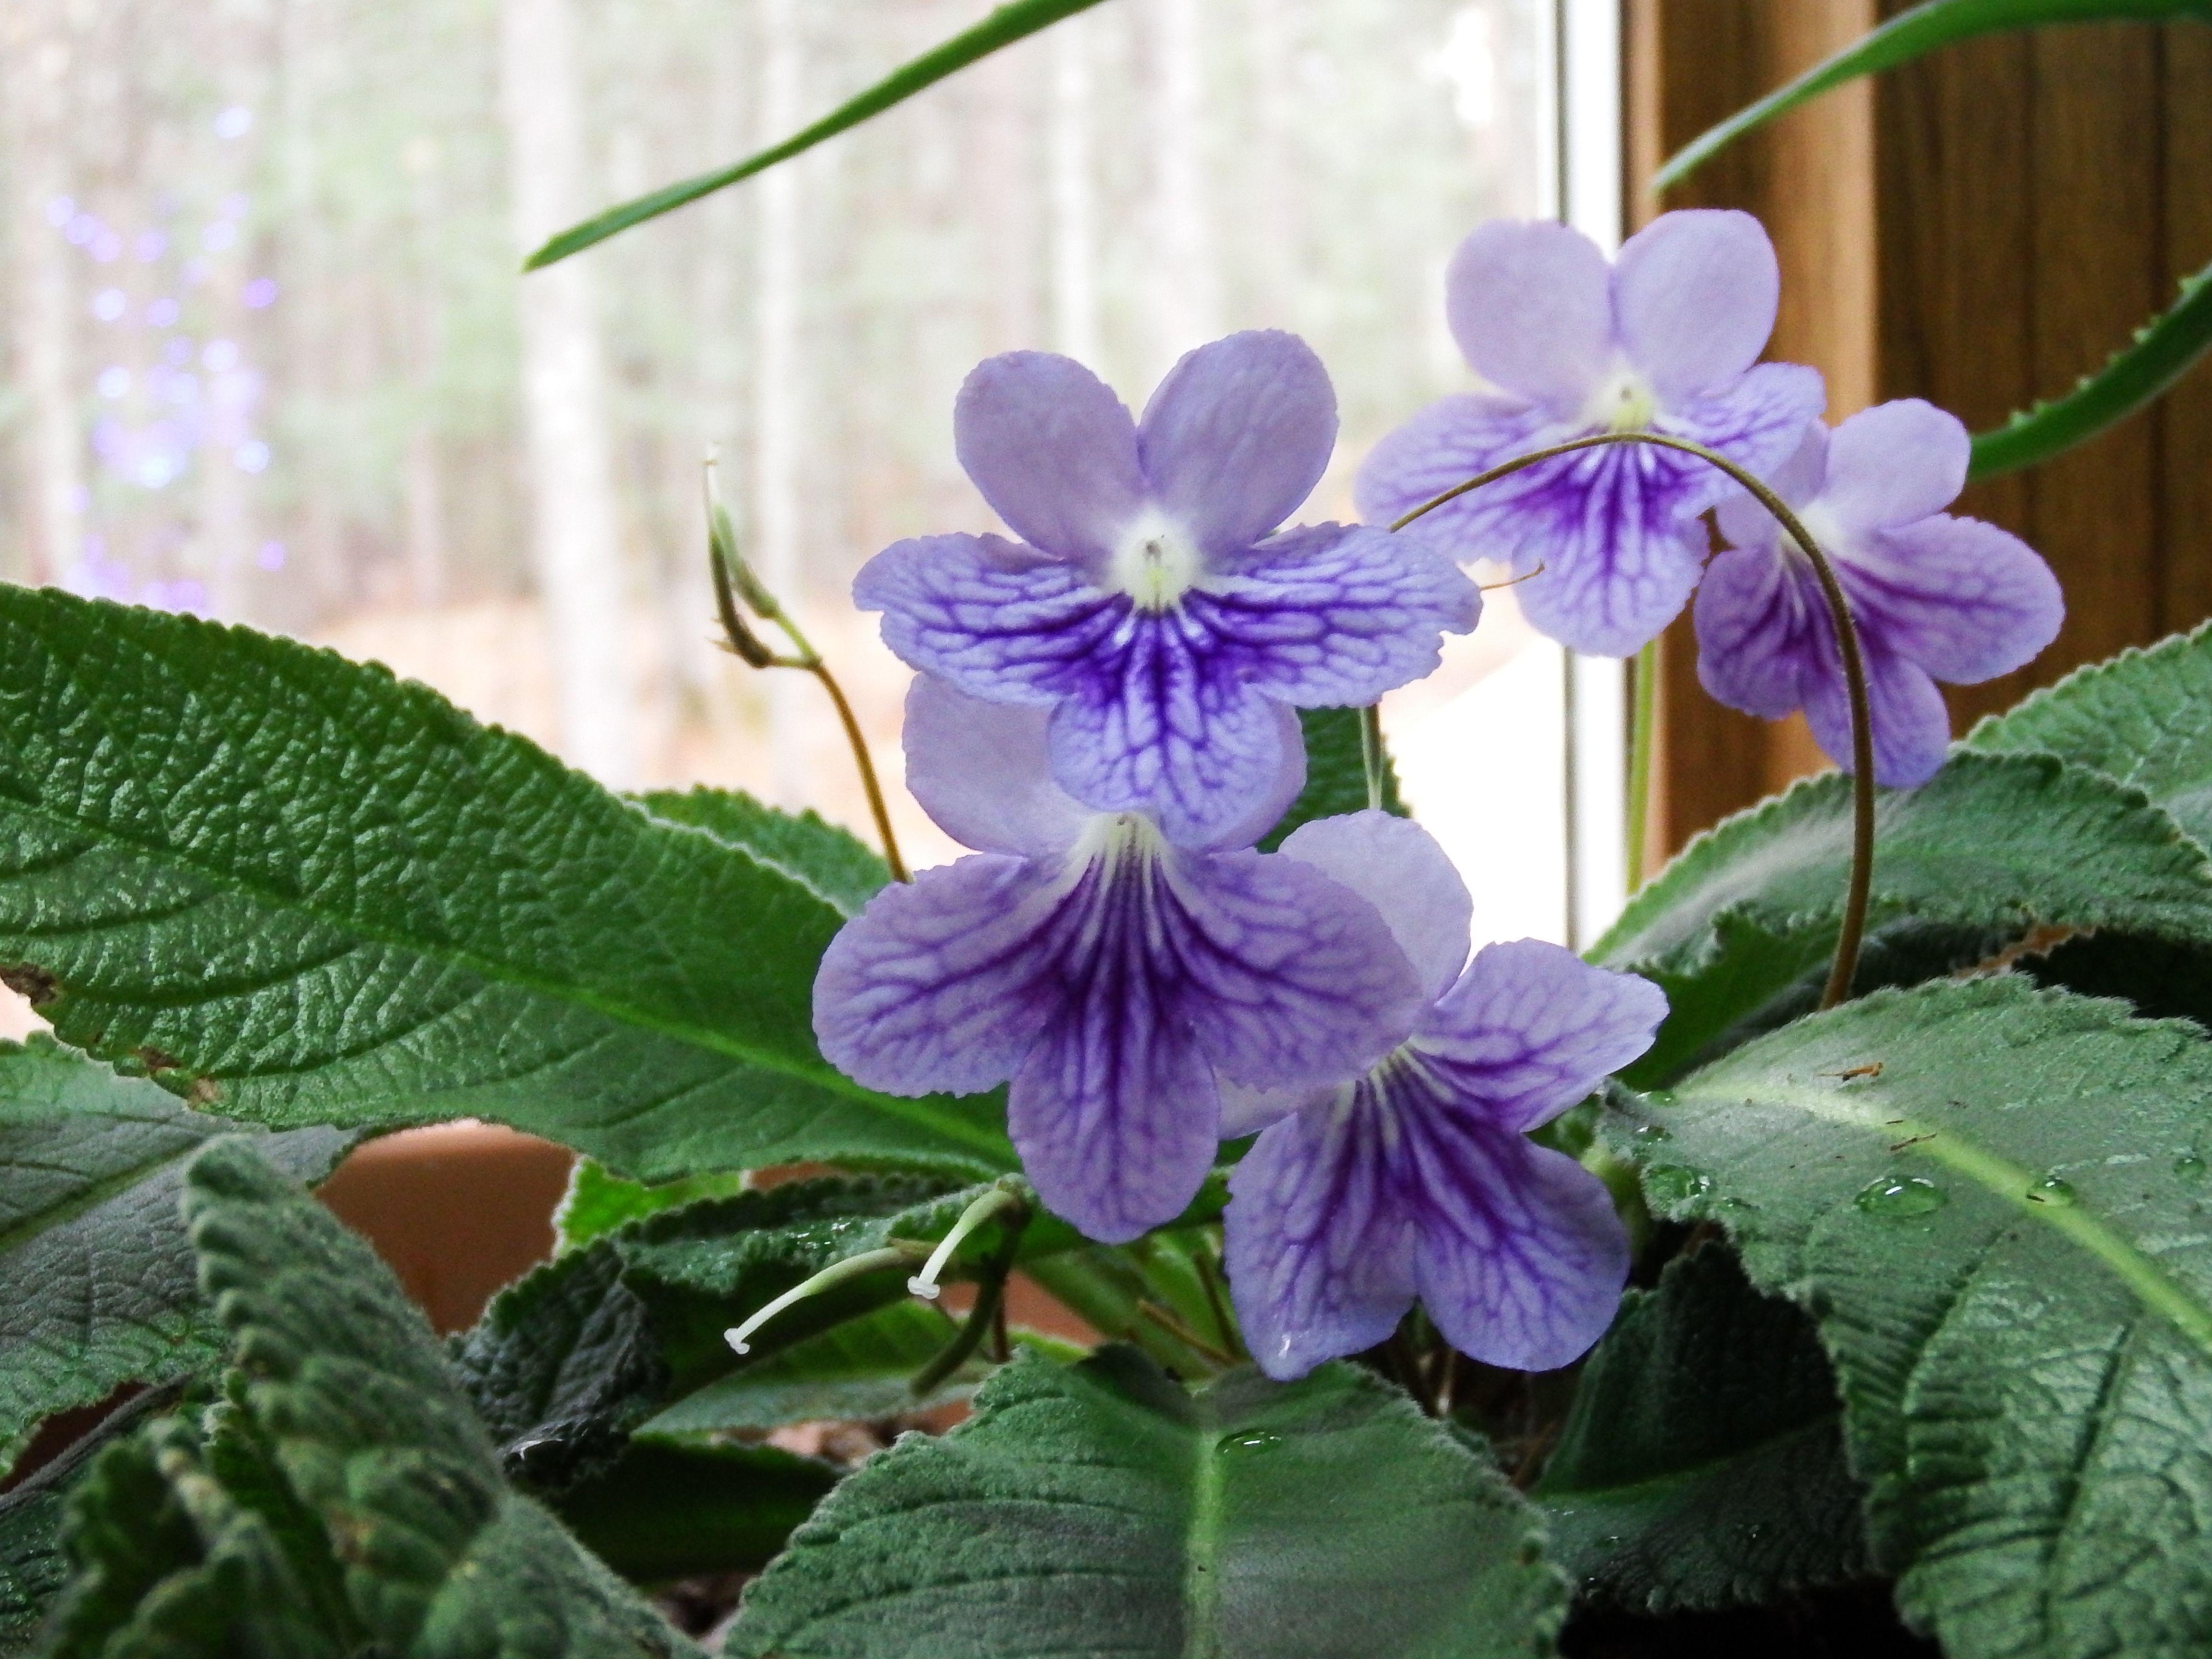 My garden window where I am visited by a spirit